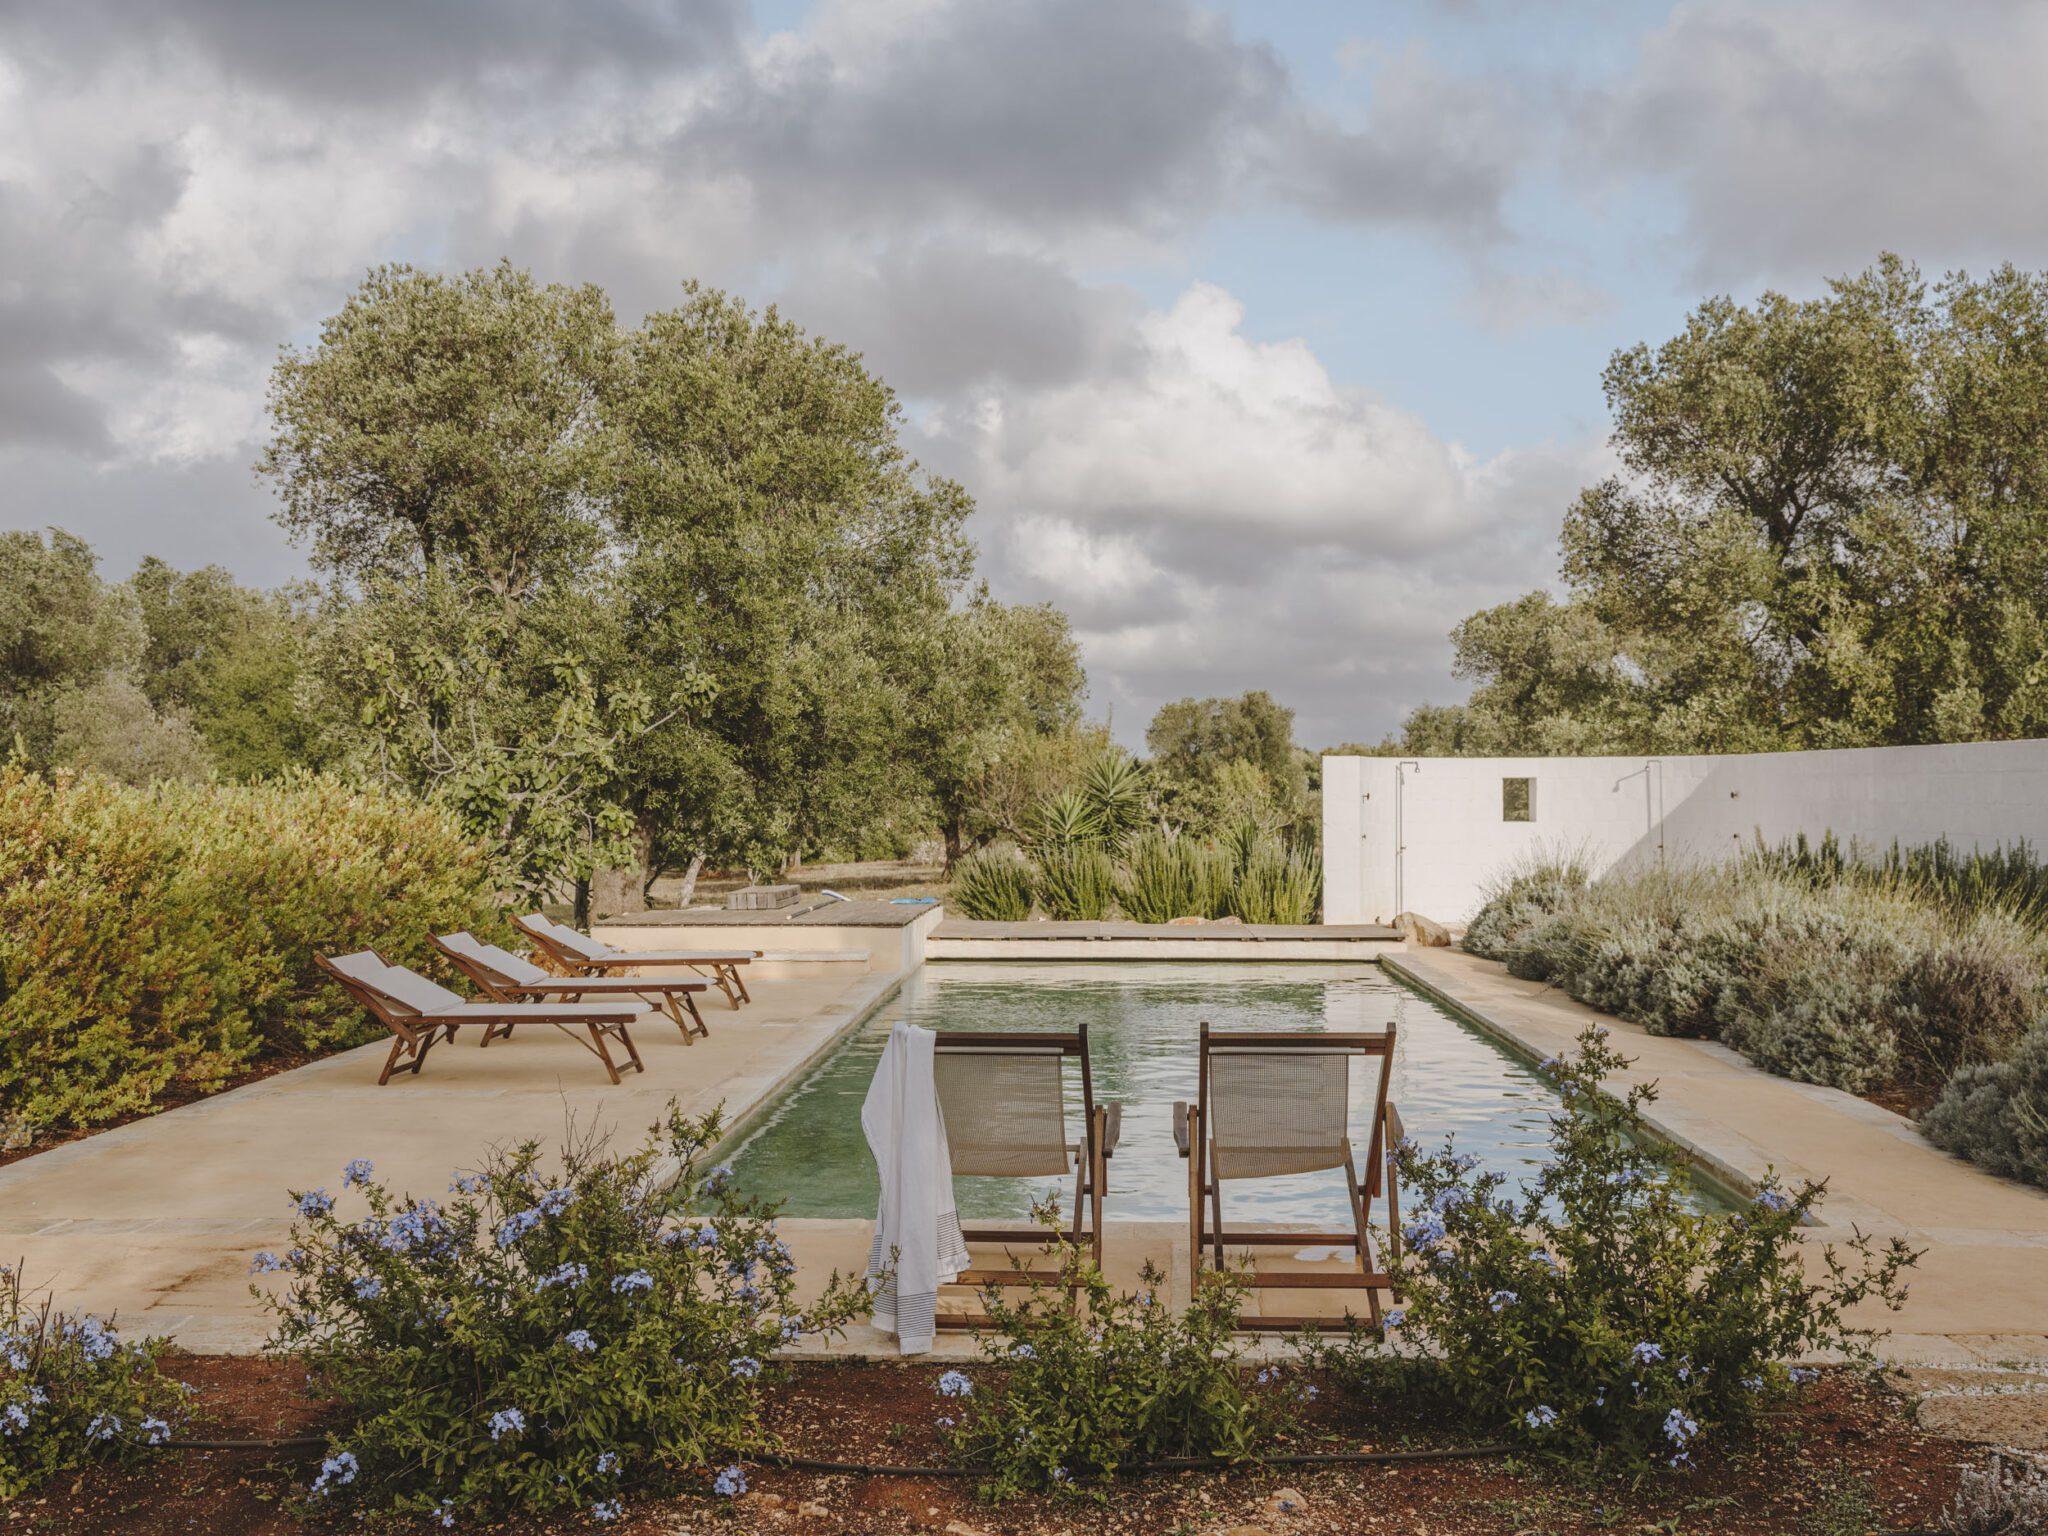 Nest Italy - Villa Set in the Heart of Rural Puglia